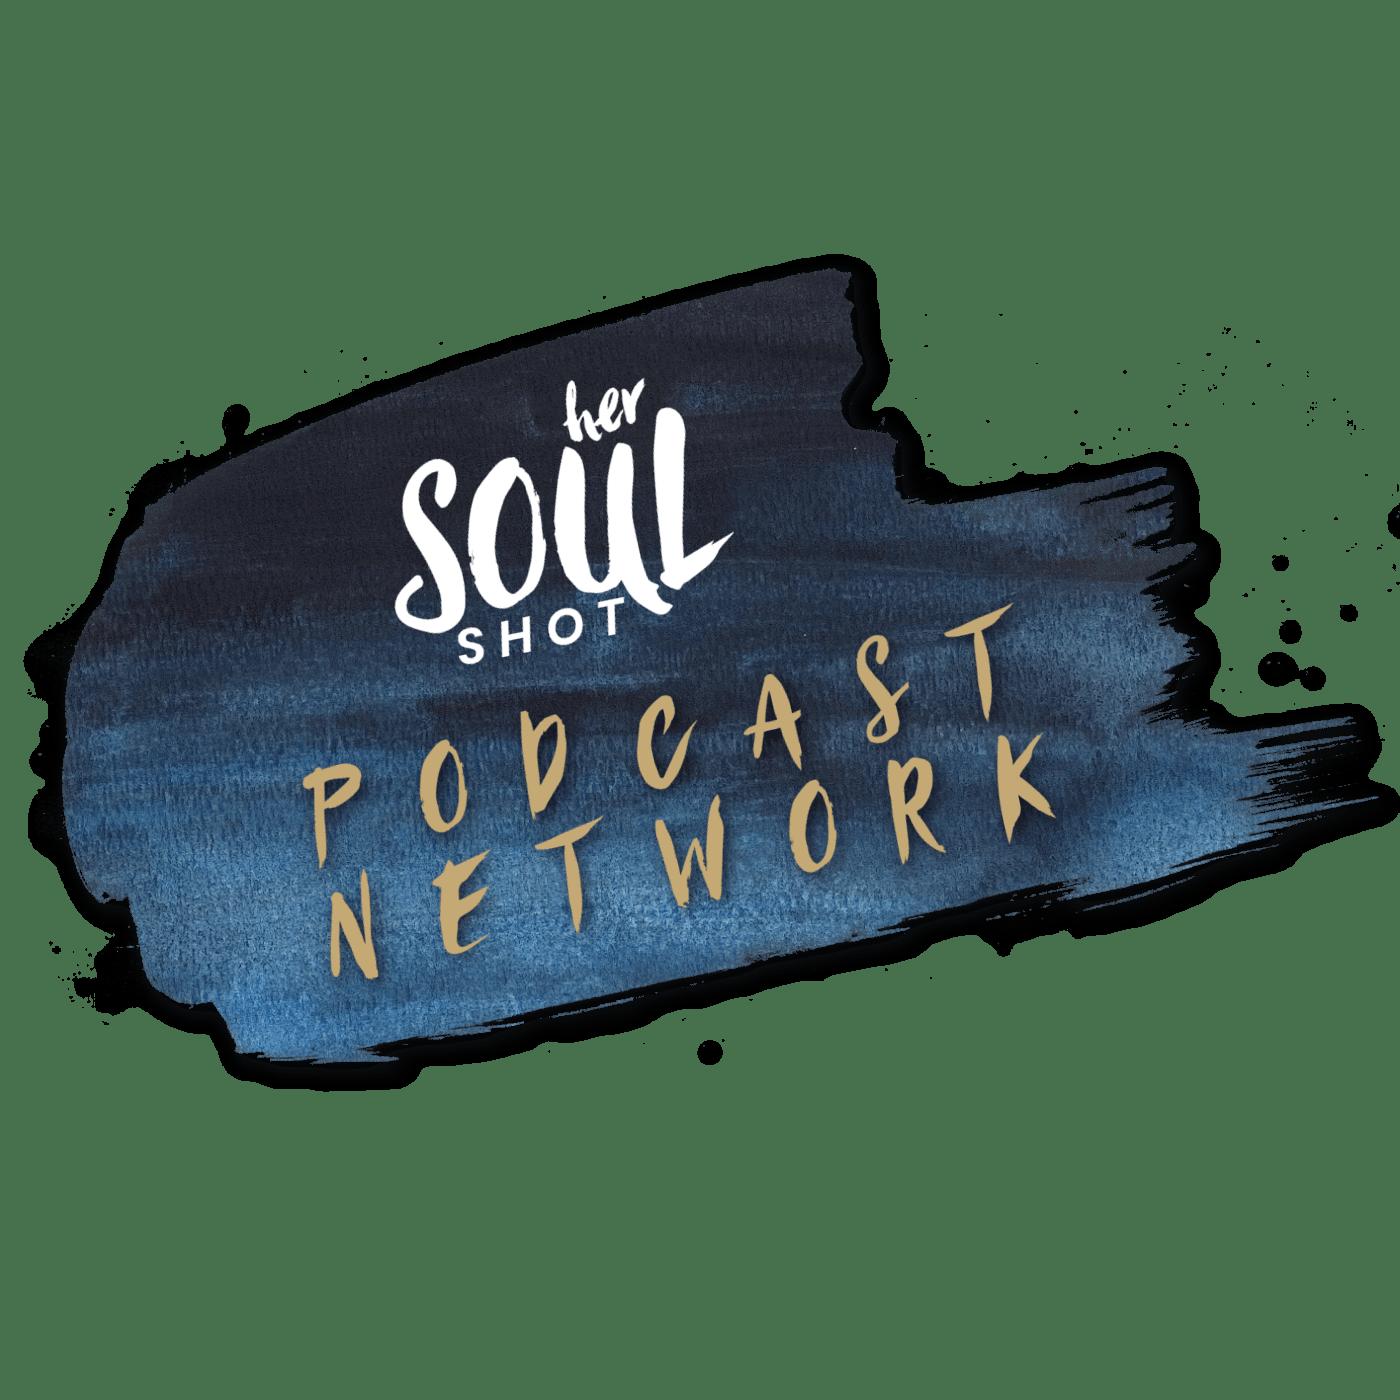 her Soul Shot Podcast Network